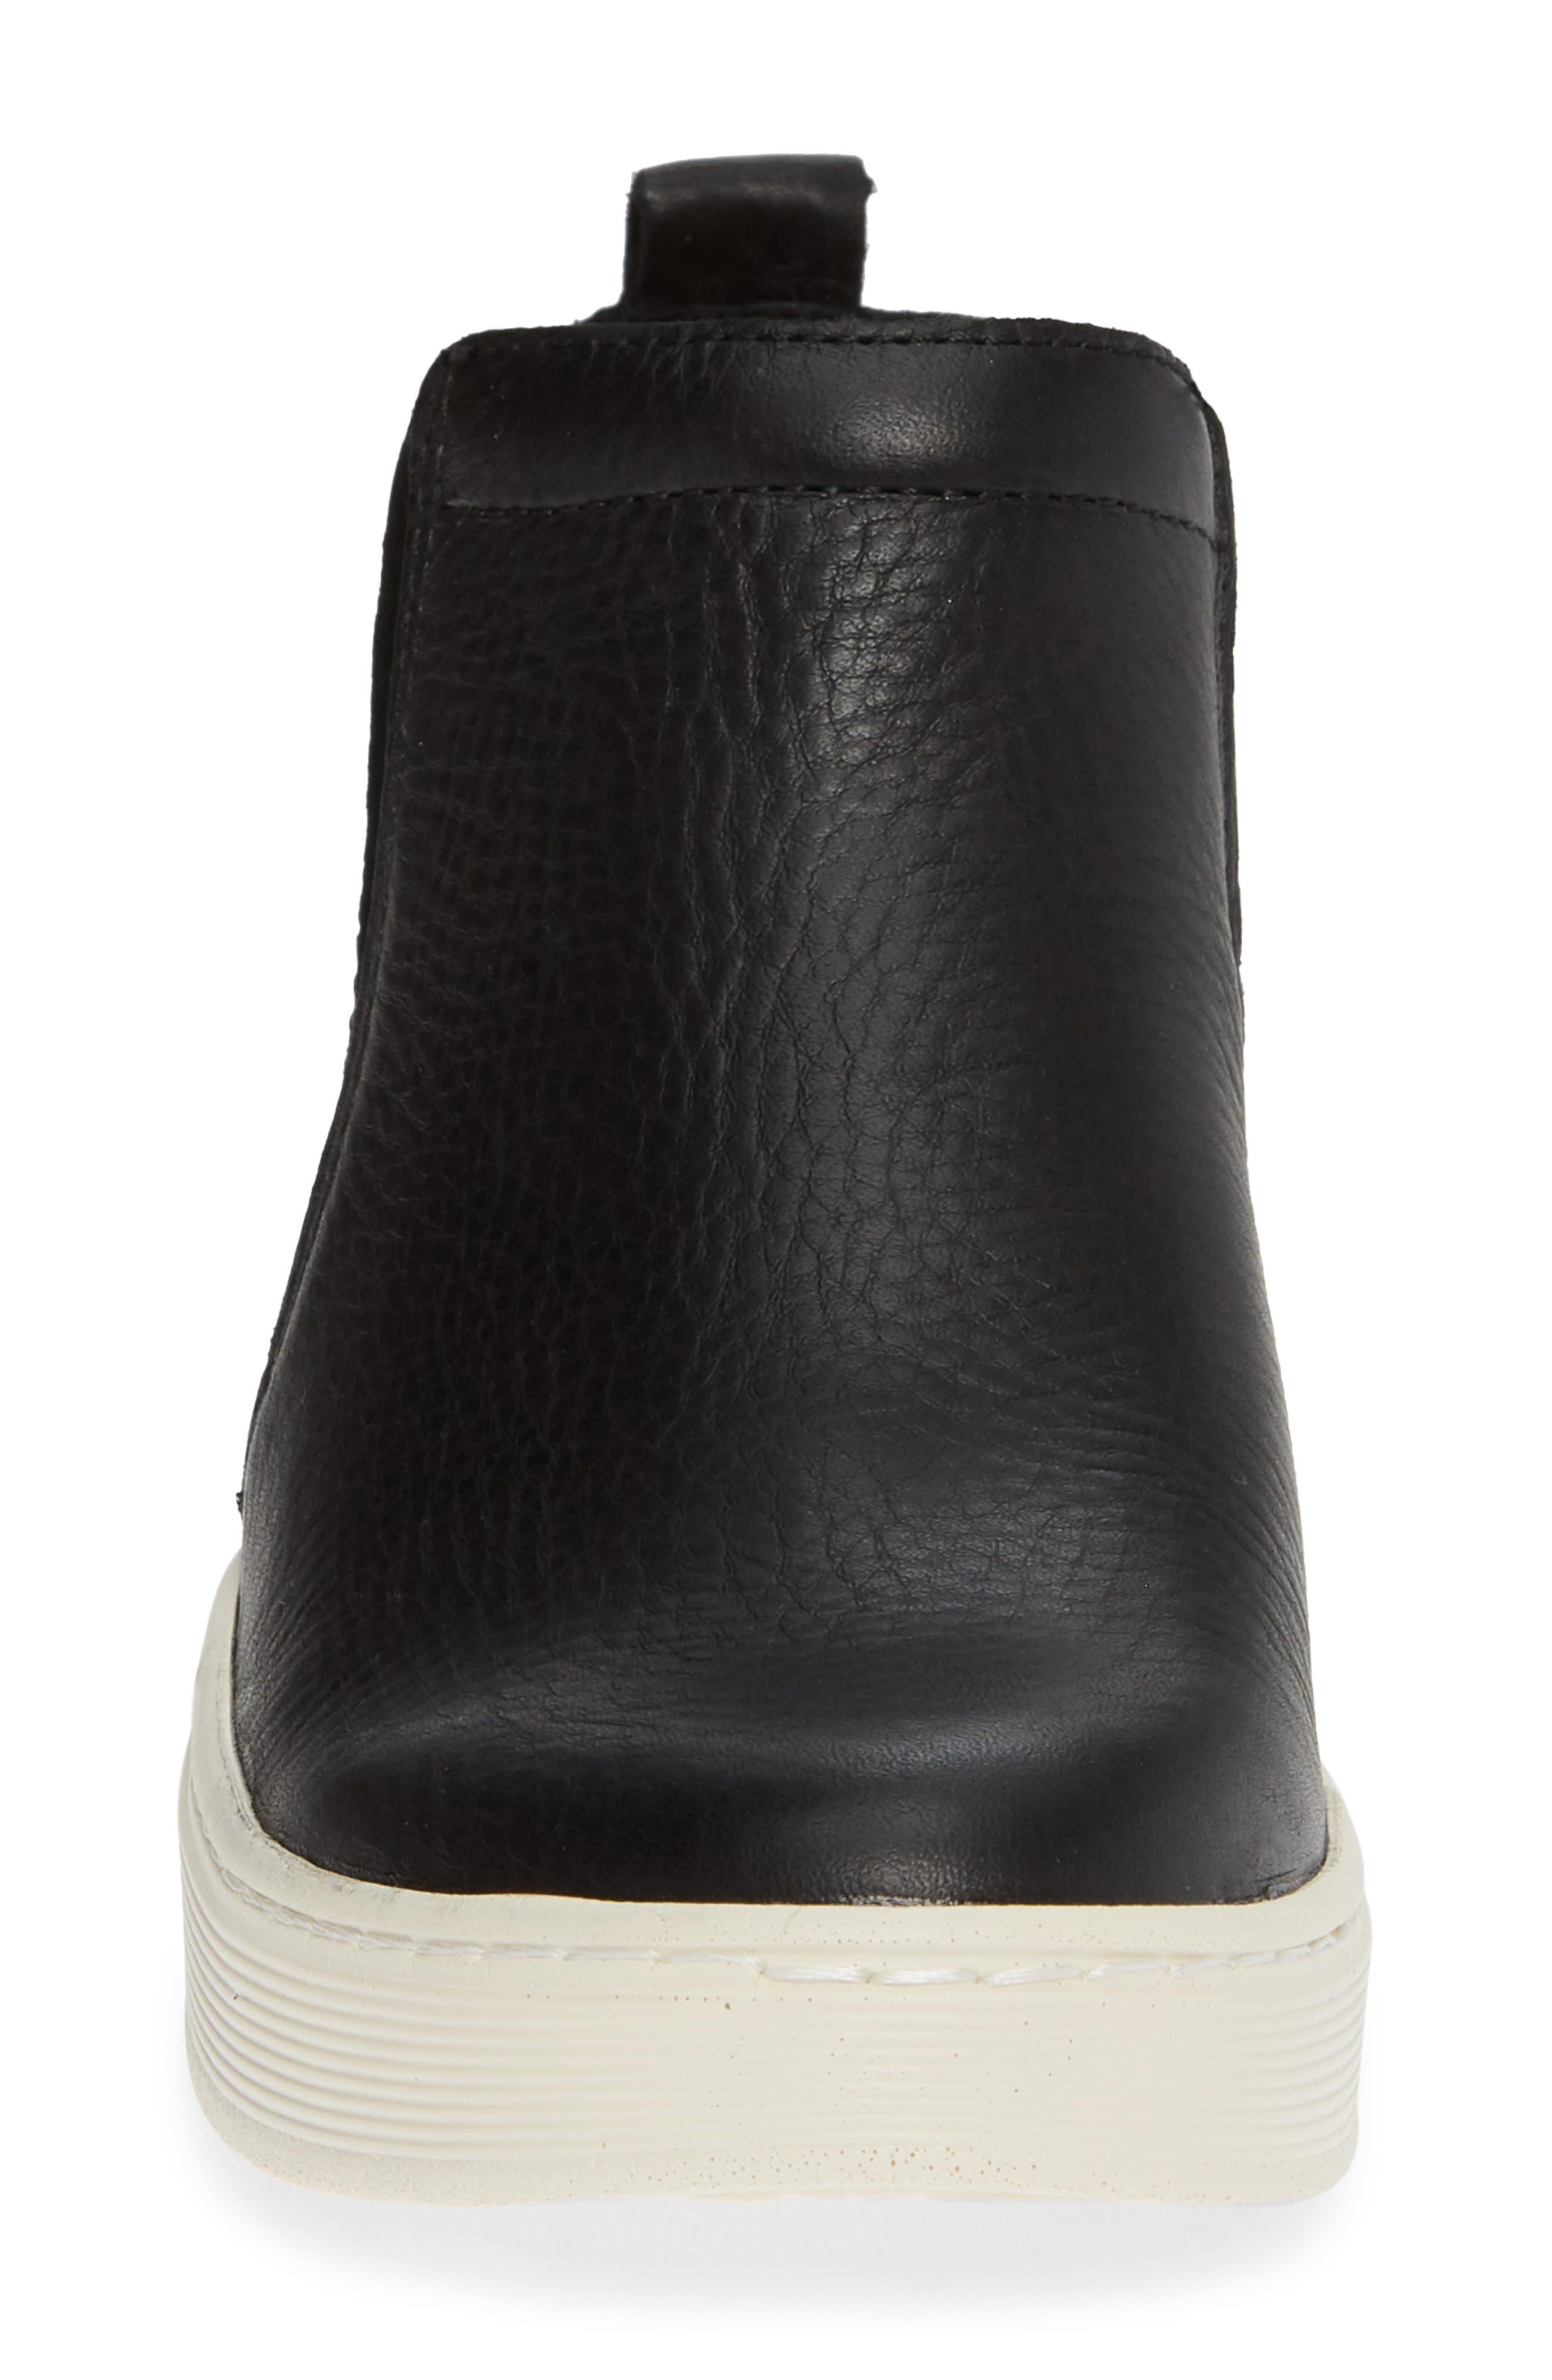 Britton II Waterproof Sneaker Bootie,                             Alternate thumbnail 4, color,                             BLACK LEATHER